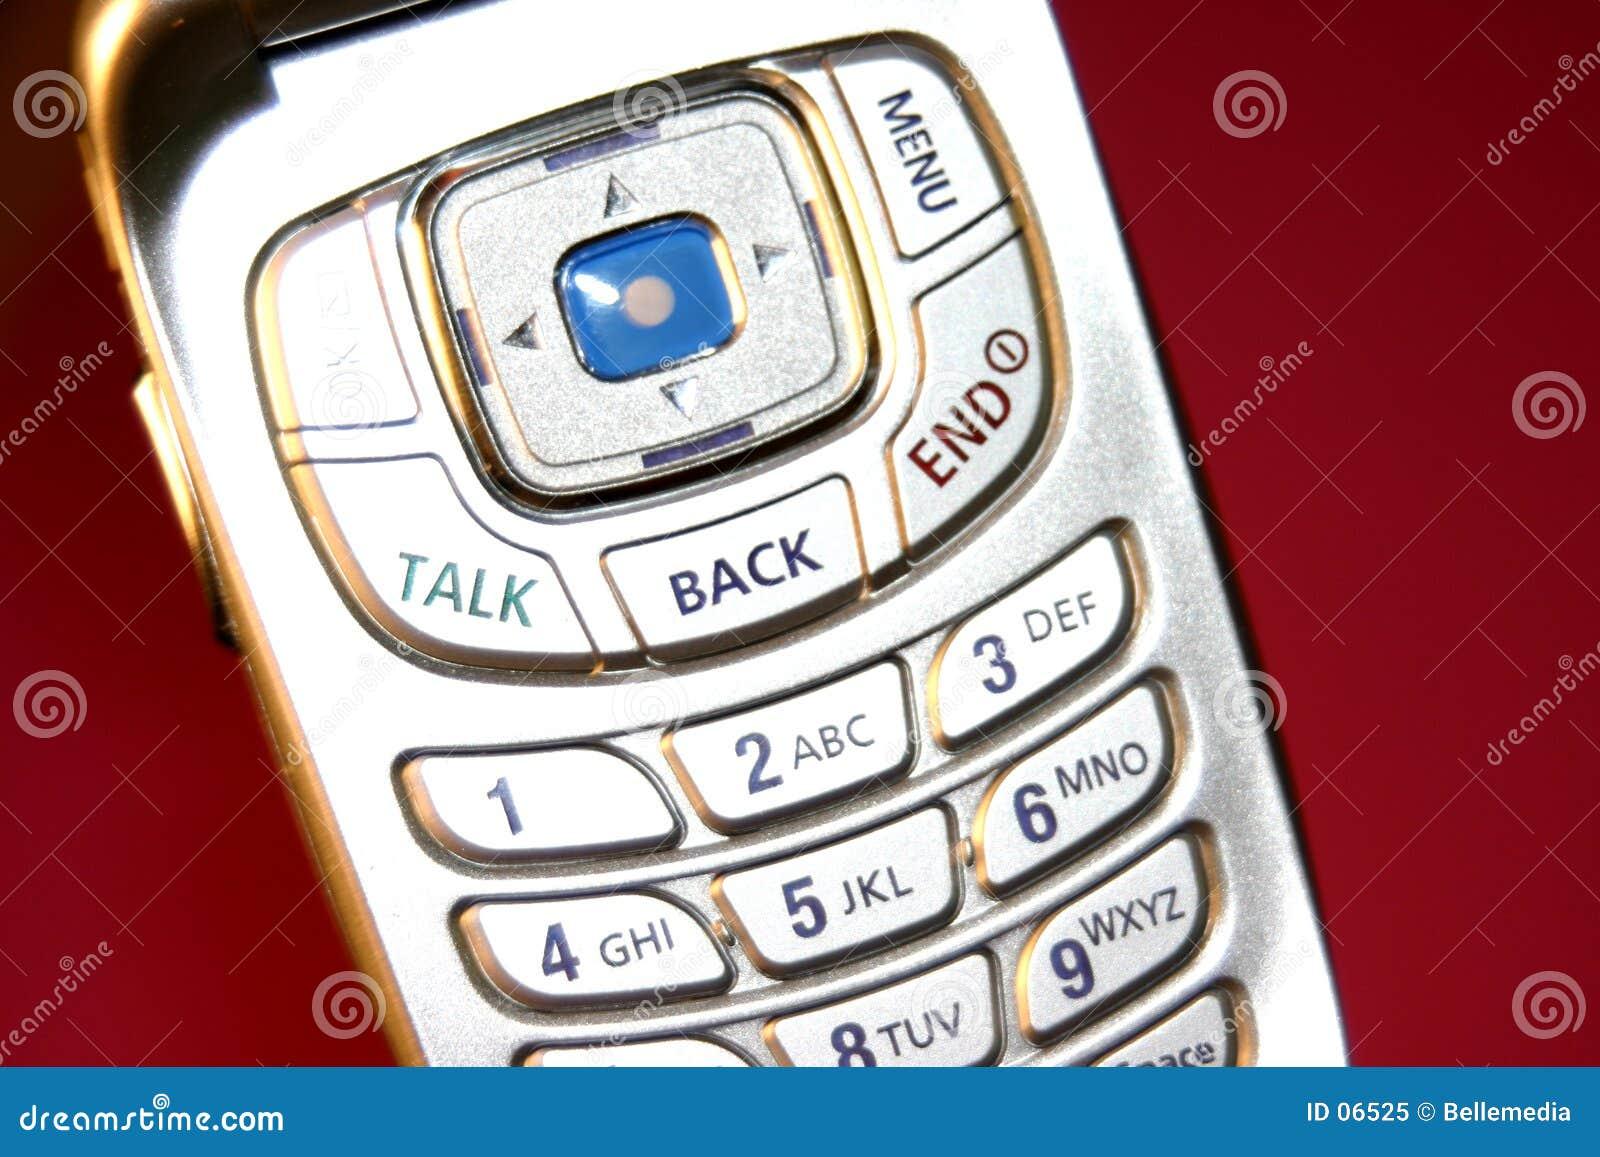 Slick phone